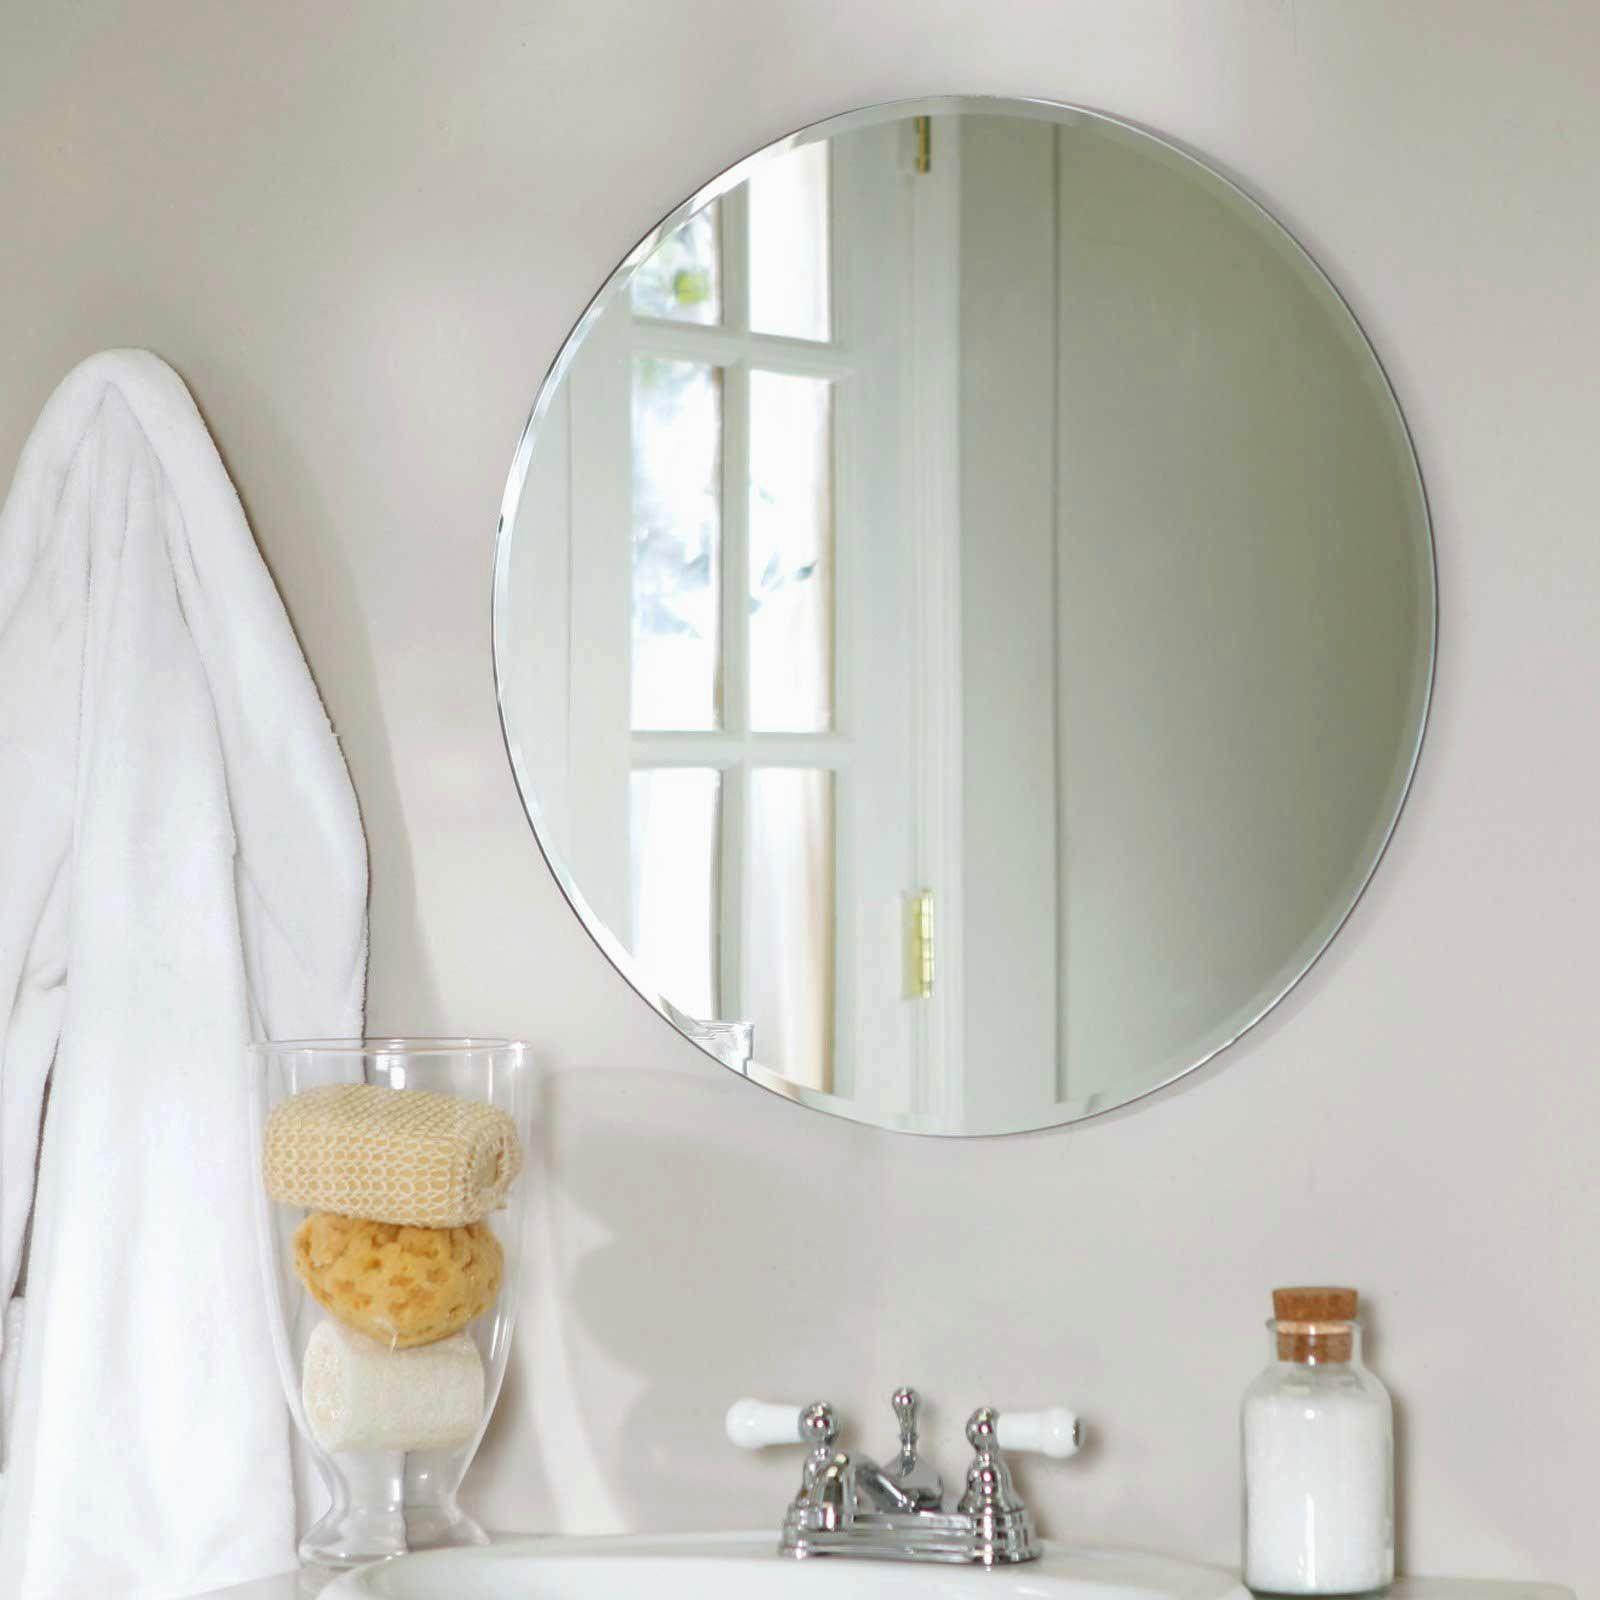 best of framed bathroom mirrors decoration-Stylish Framed Bathroom Mirrors Picture